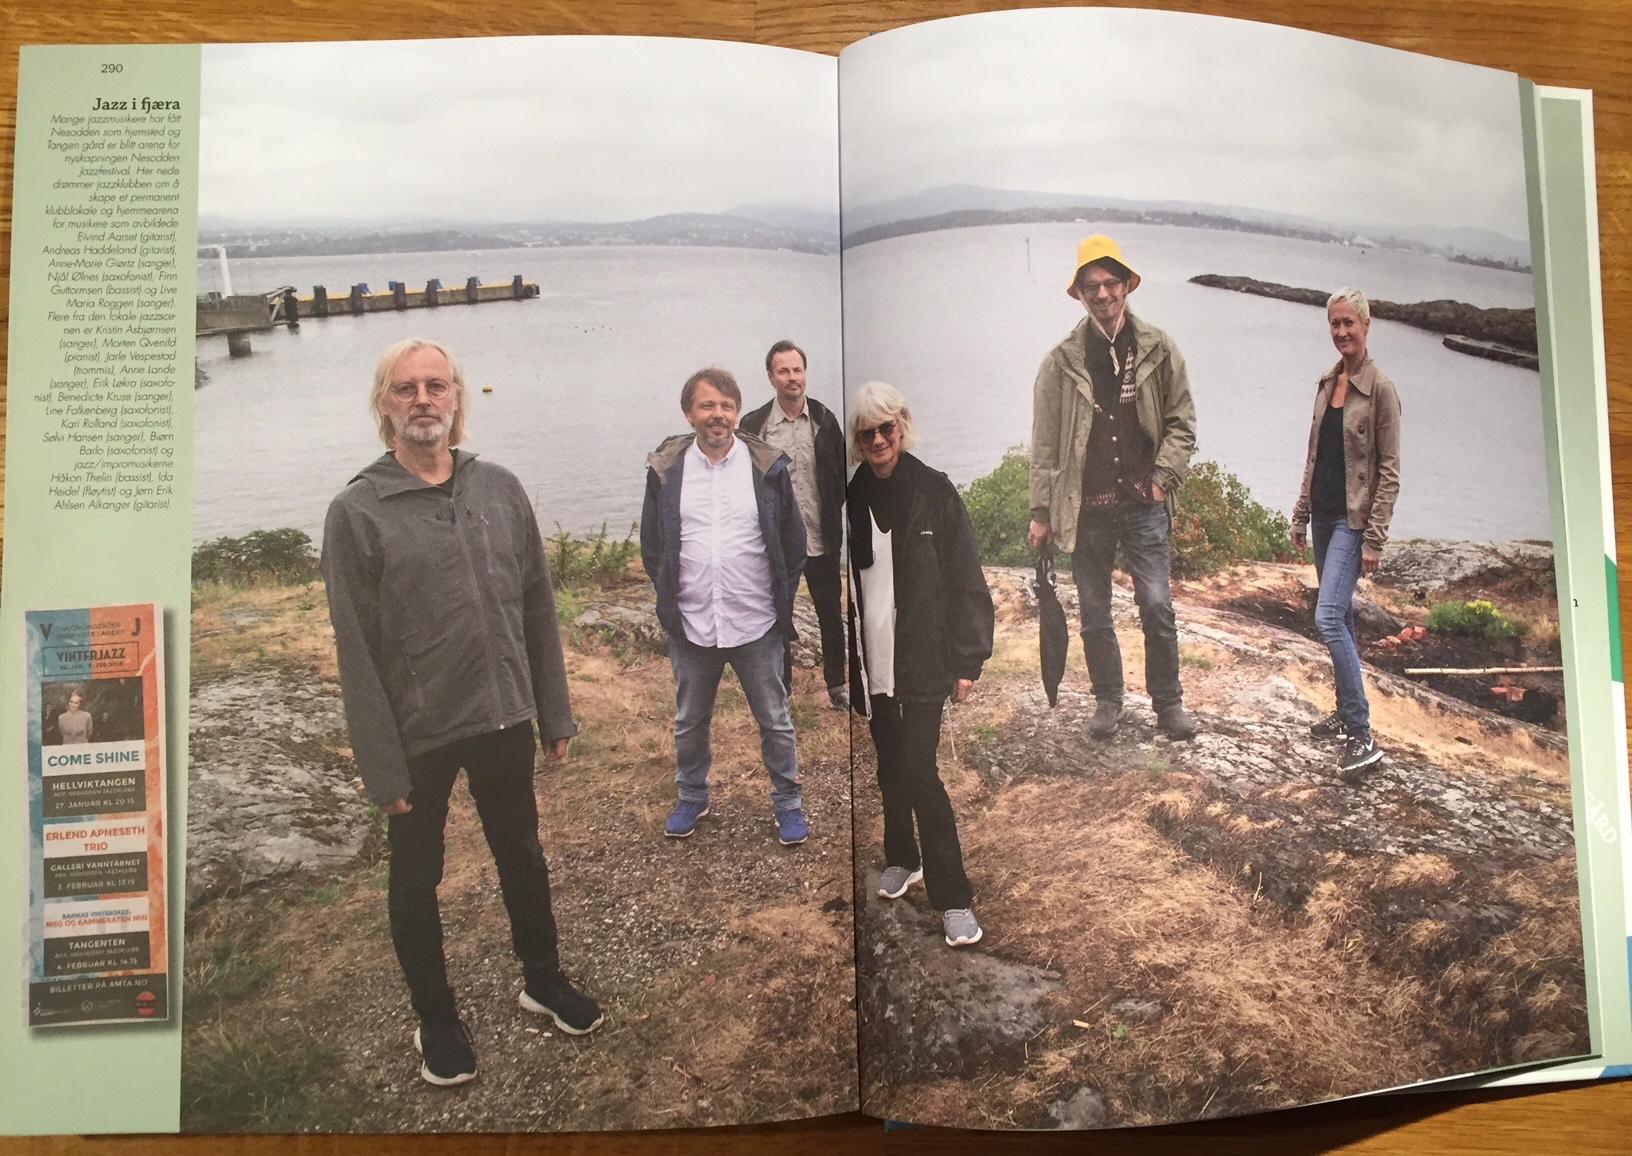 "From the book ""Kunstnerkommunen"" by Kathrine Geard (Ford forlag 2018). From left: Eivind Aarset, Andreas Haddeland, Njål Ølnes, Anne-Marie Giørtz, Finn Guttormsen, Live Maria Roggen. Photo: Kathrine Geard"